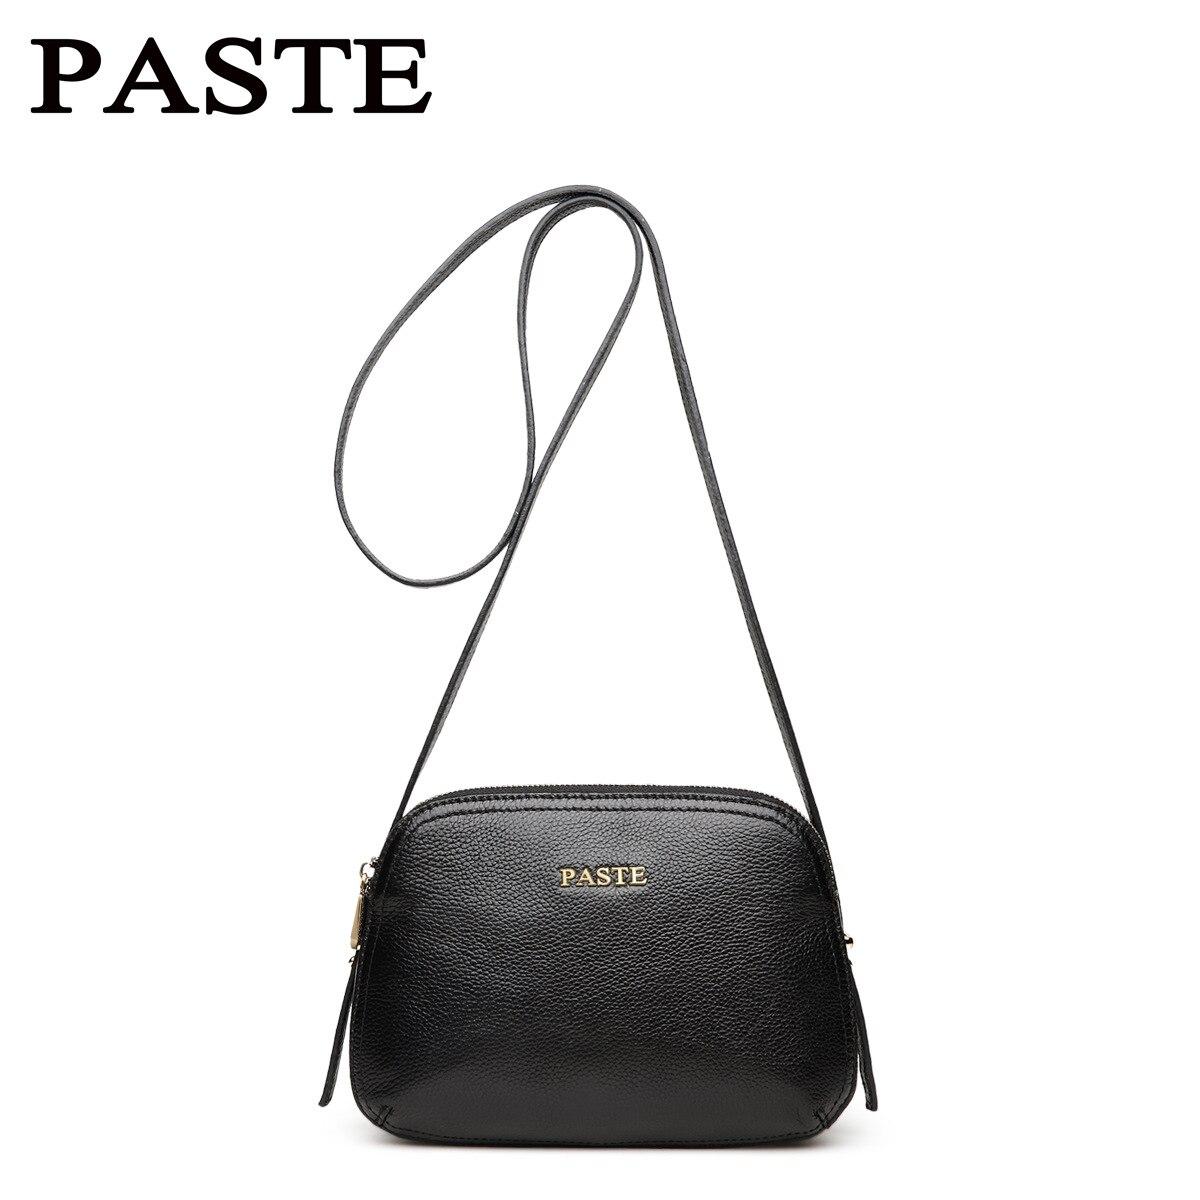 купить 2017 spring summer new leather handbag Crossbody Bag small head layer cowhide bag fashionista 0308 по цене 5099.81 рублей